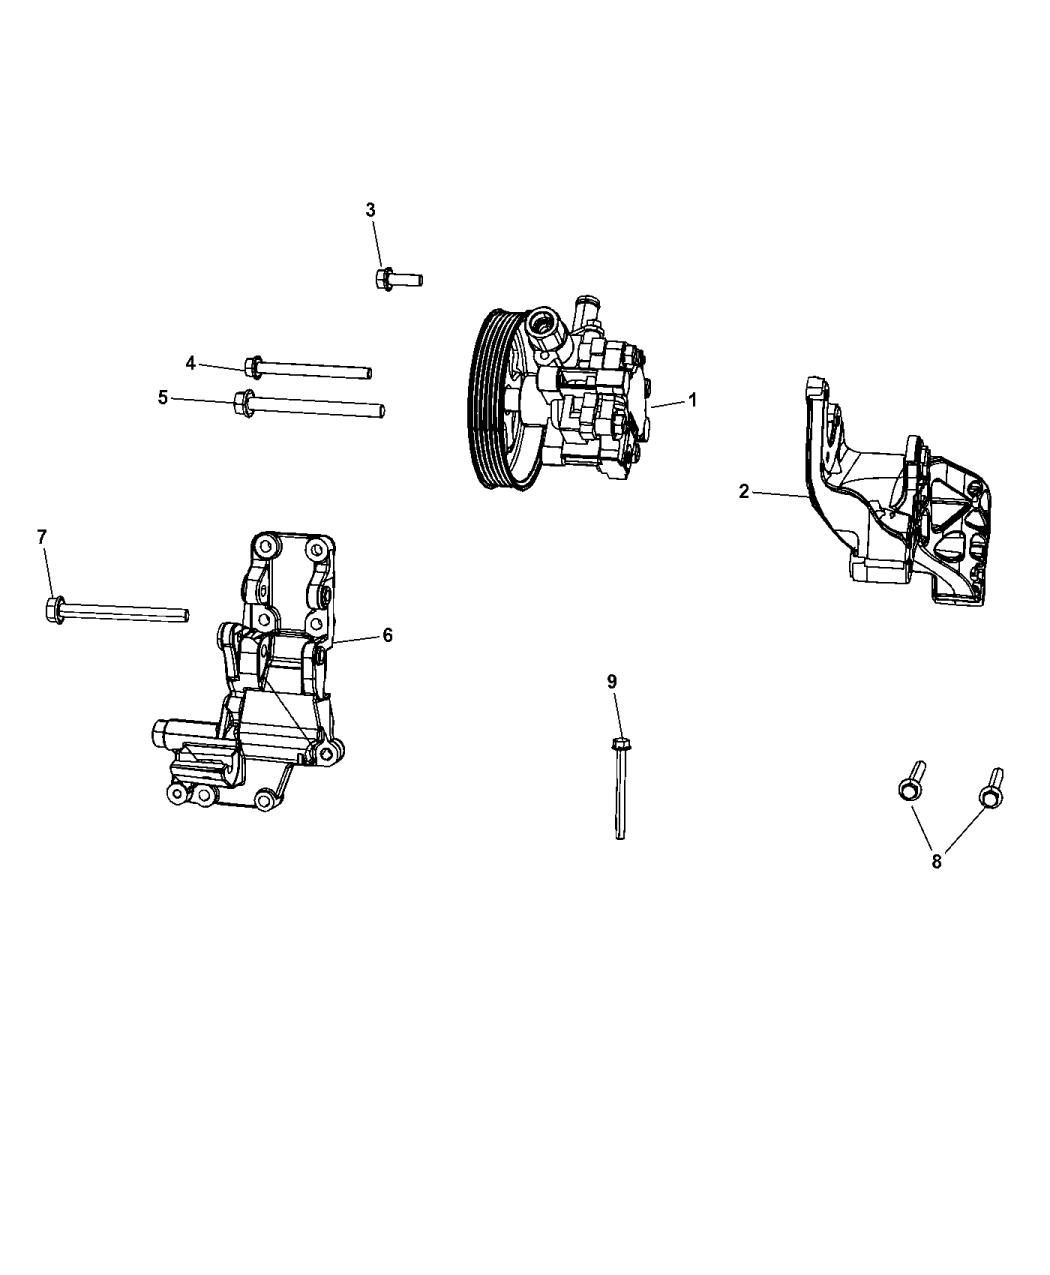 5151016ae